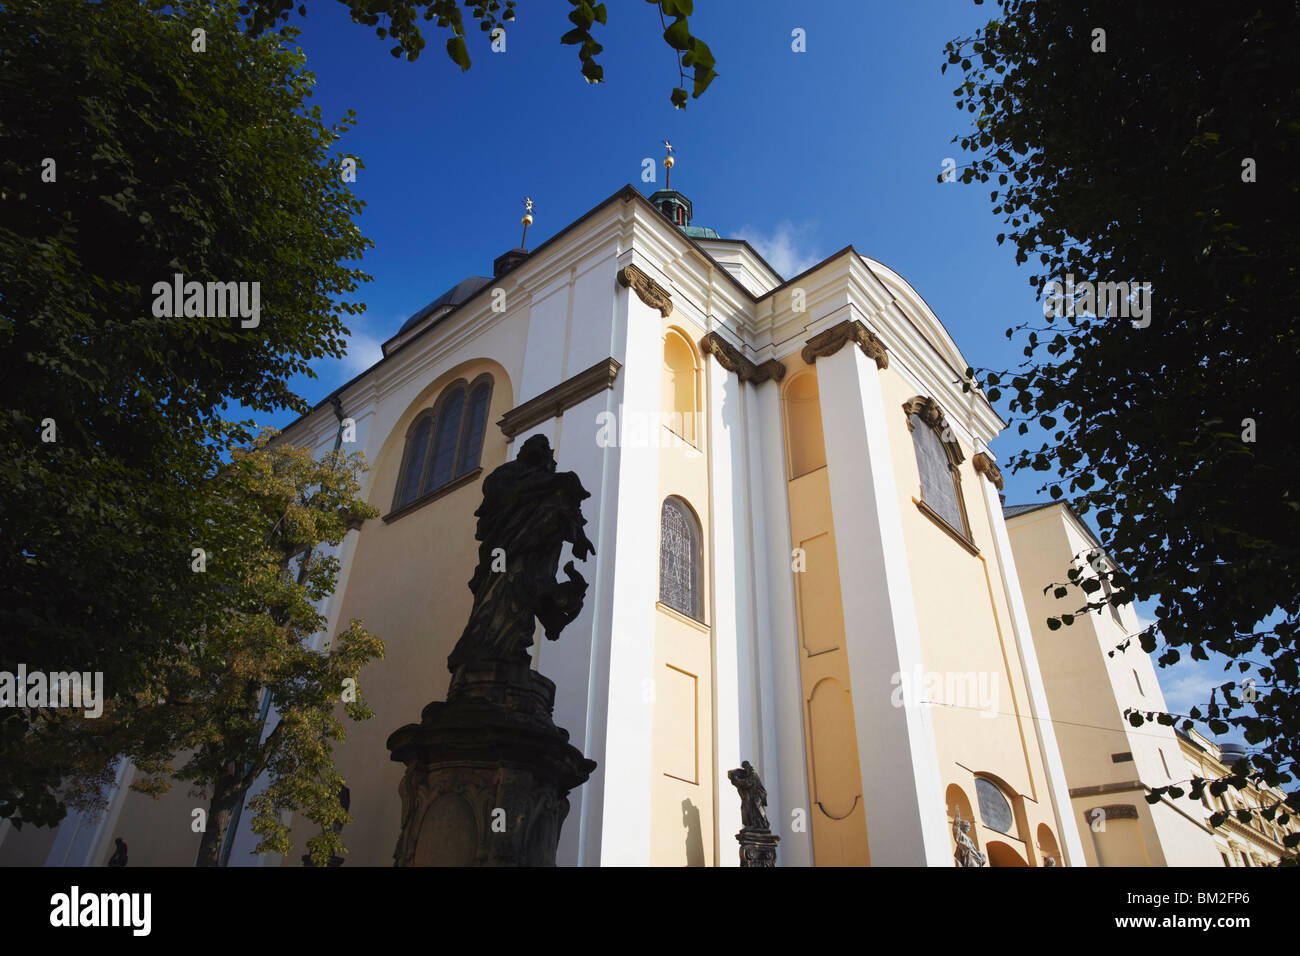 St. Michael's Church, Olomouc, Moravia, Czech Republic - Stock Image